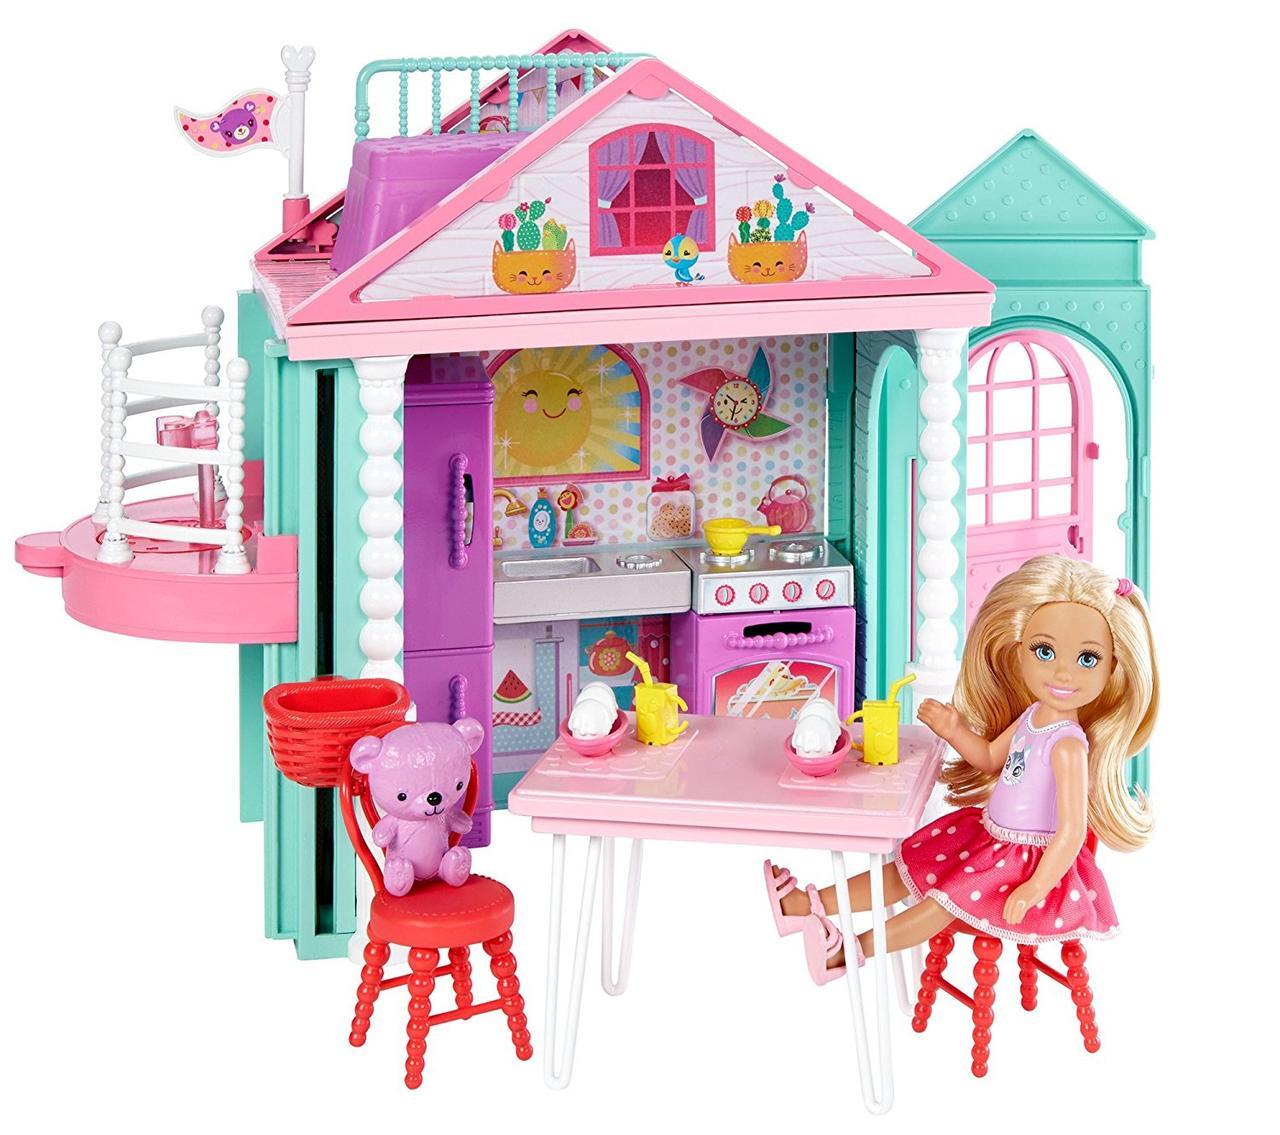 Барби Домик развлечений Челси Barbie с лифтом Barbie Club Chelsea Playhouse